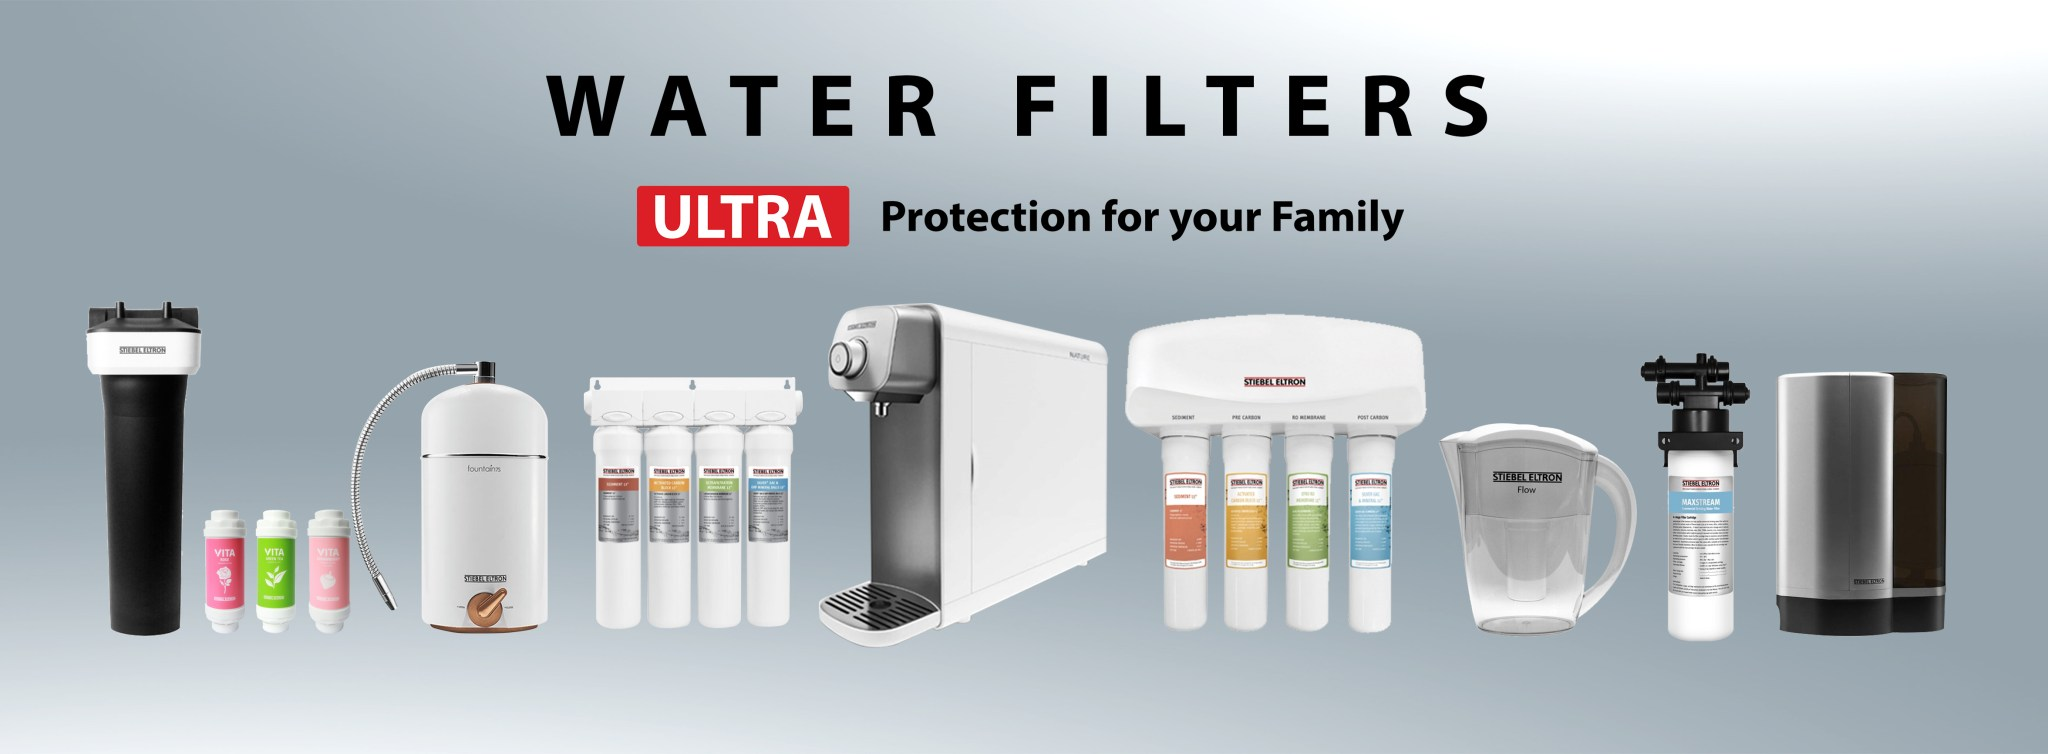 water filter header